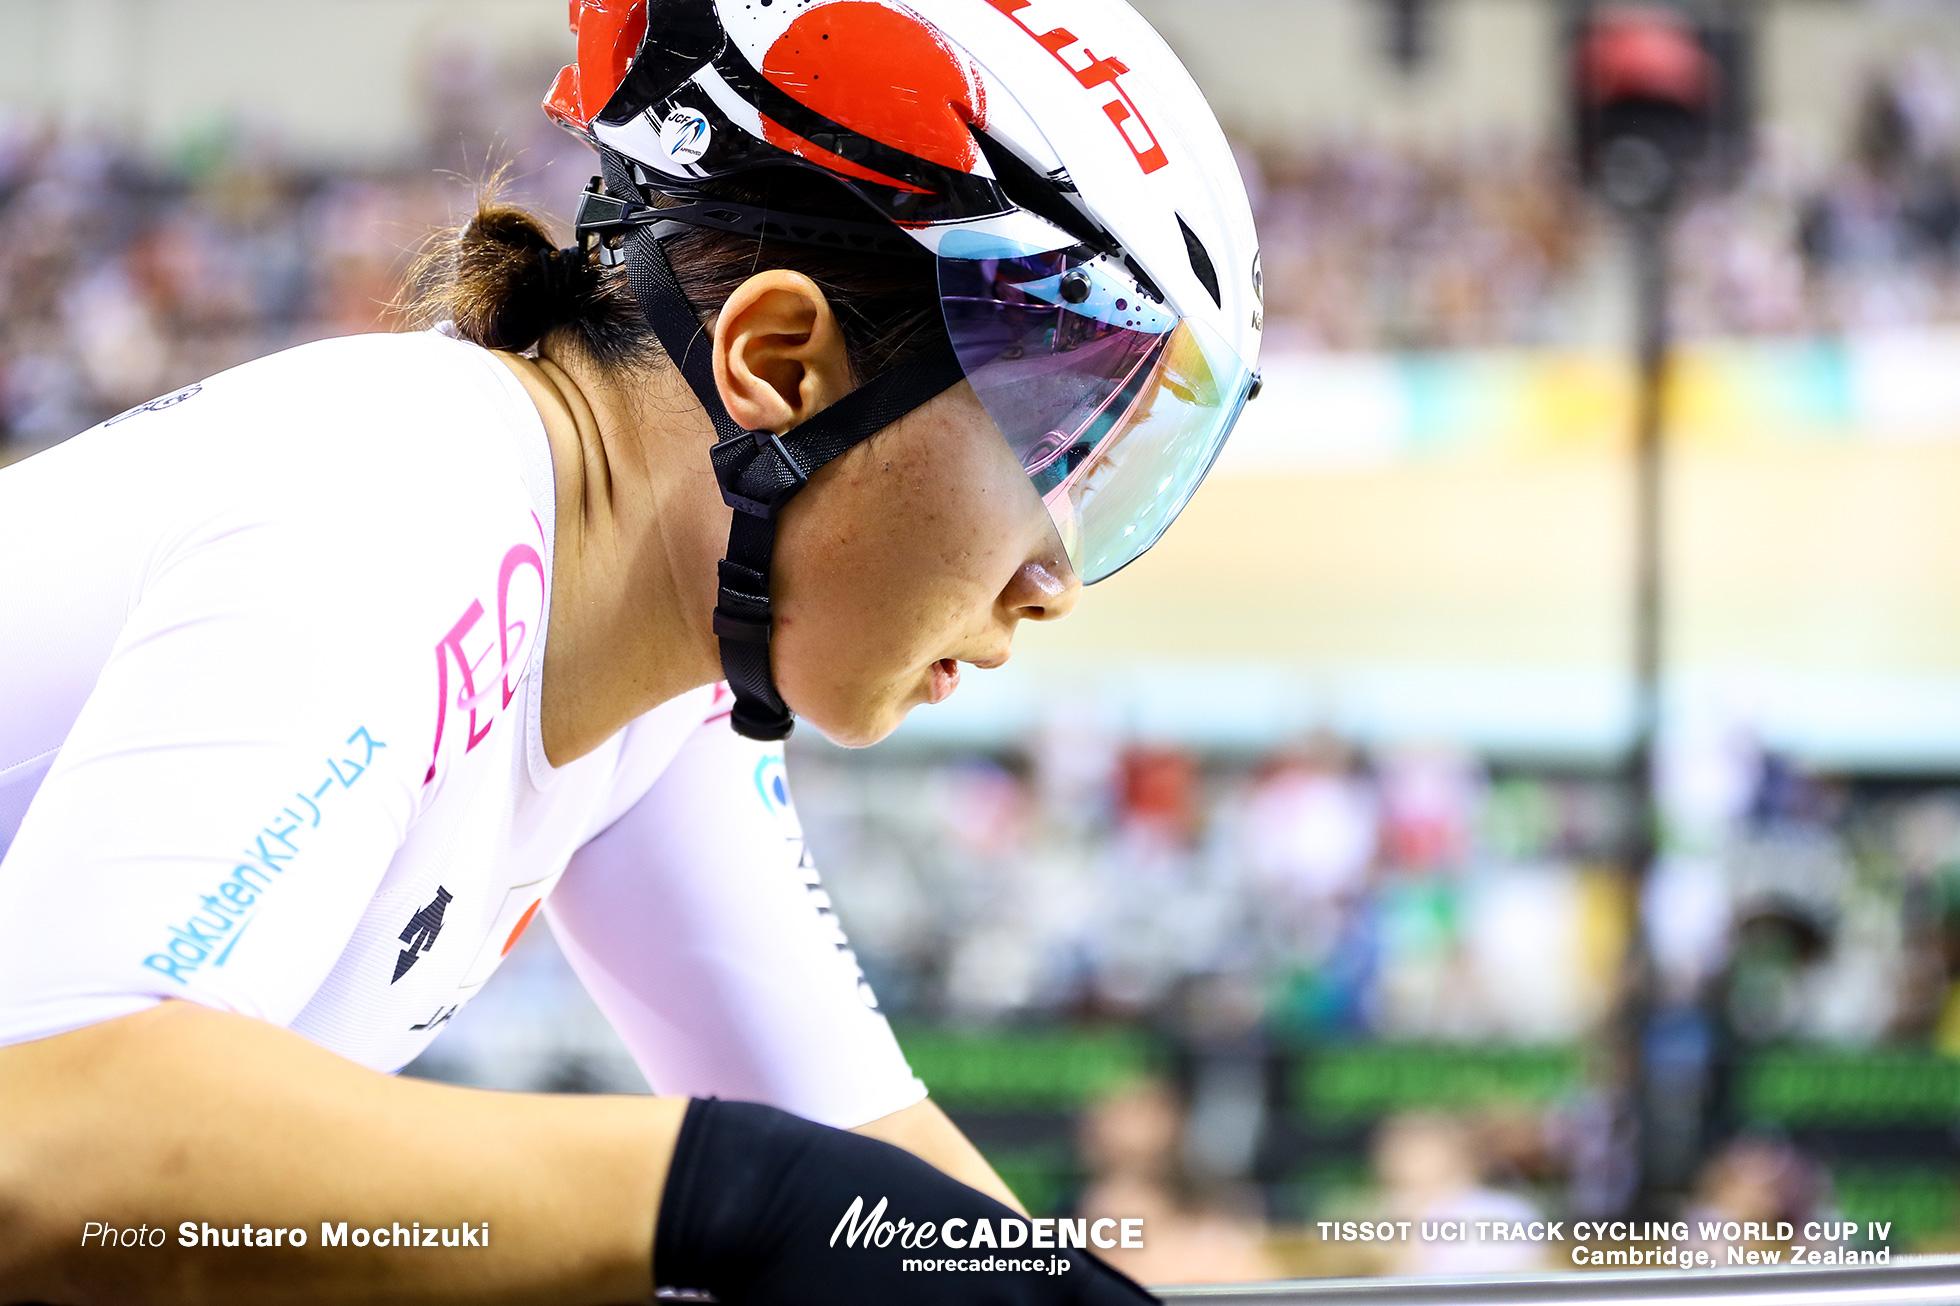 Elimination / Women's Omnium / TISSOT UCI TRACK CYCLING WORLD CUP IV, Cambridge, New Zealand, 梶原悠未